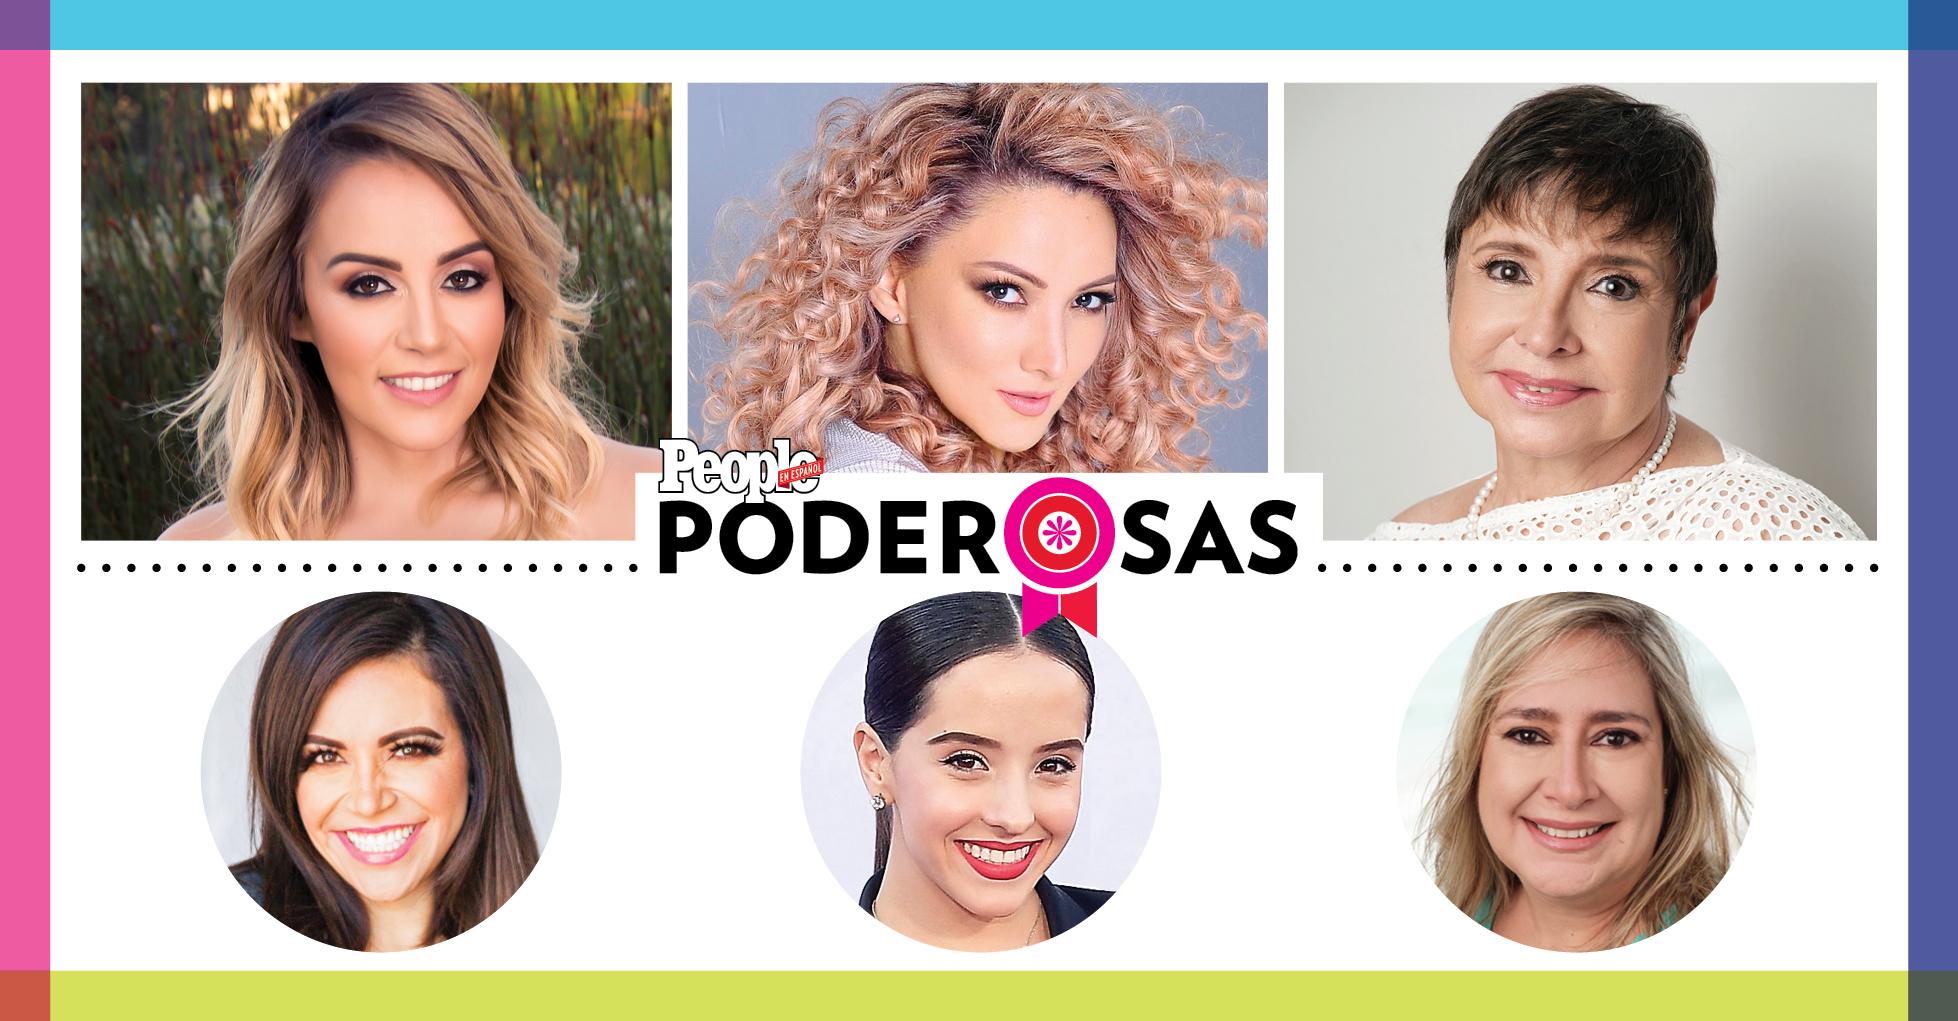 Poderosas 2021 tres finalistas